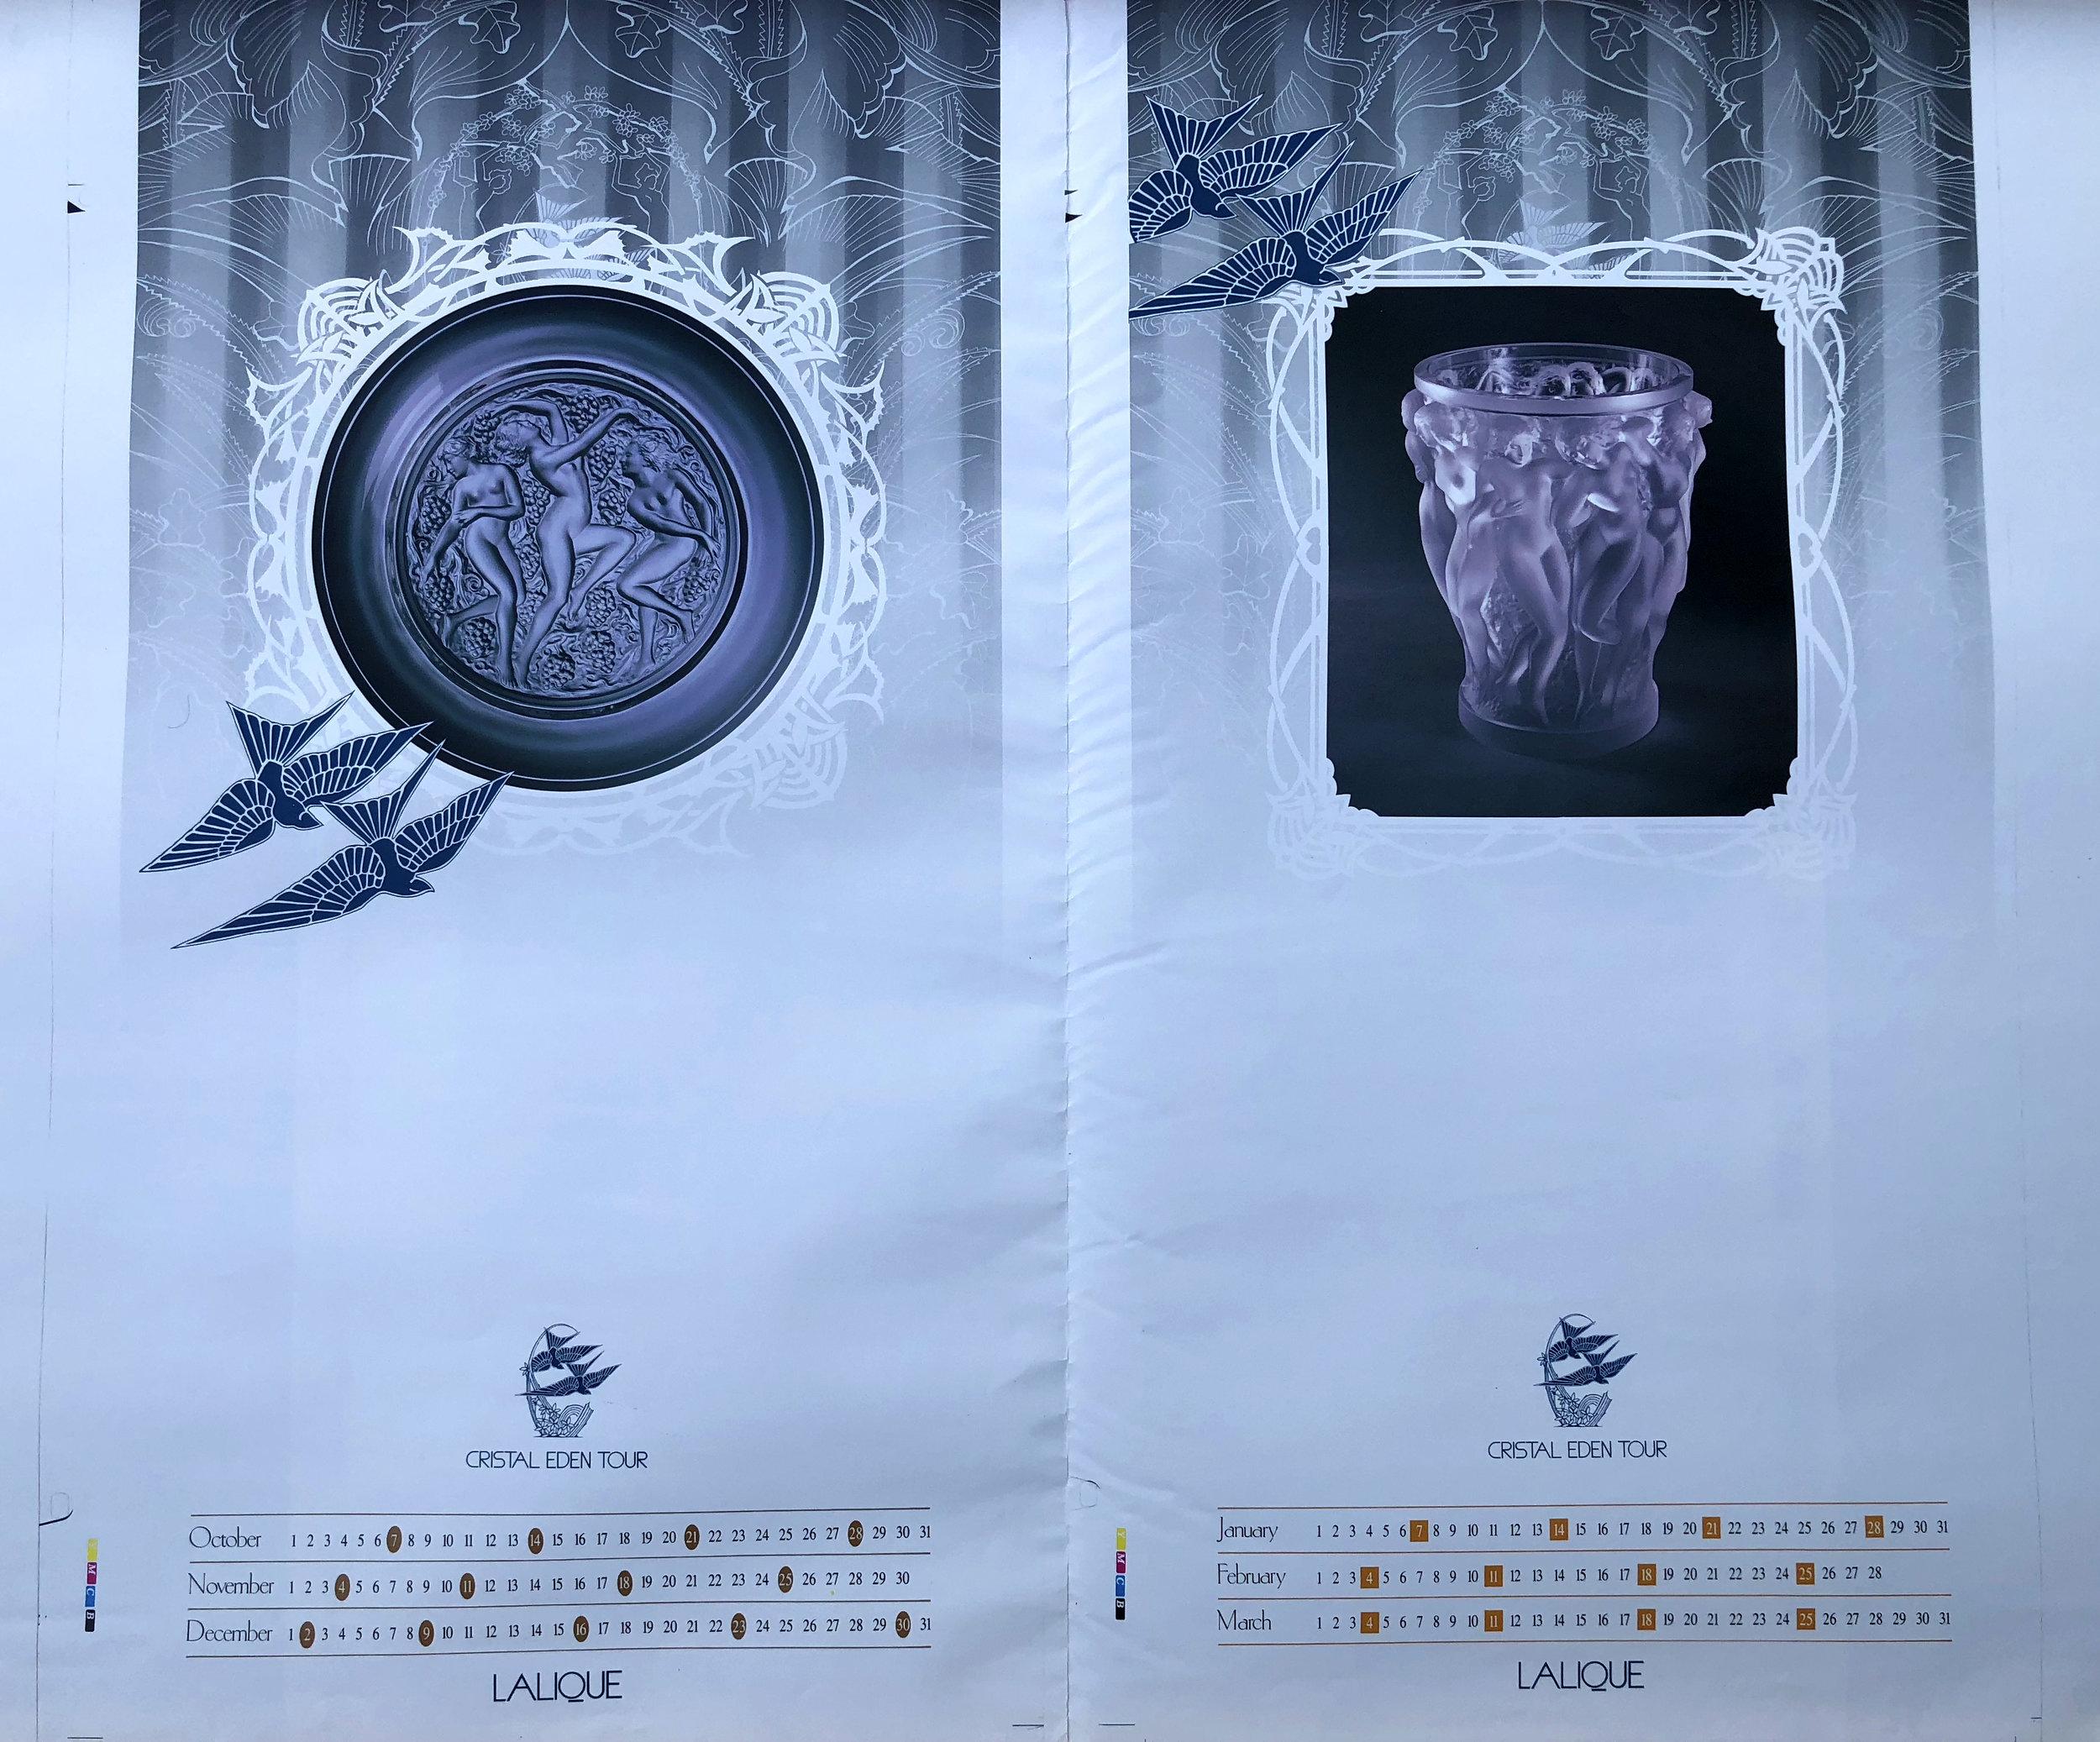 Lalique calendar 1.jpg